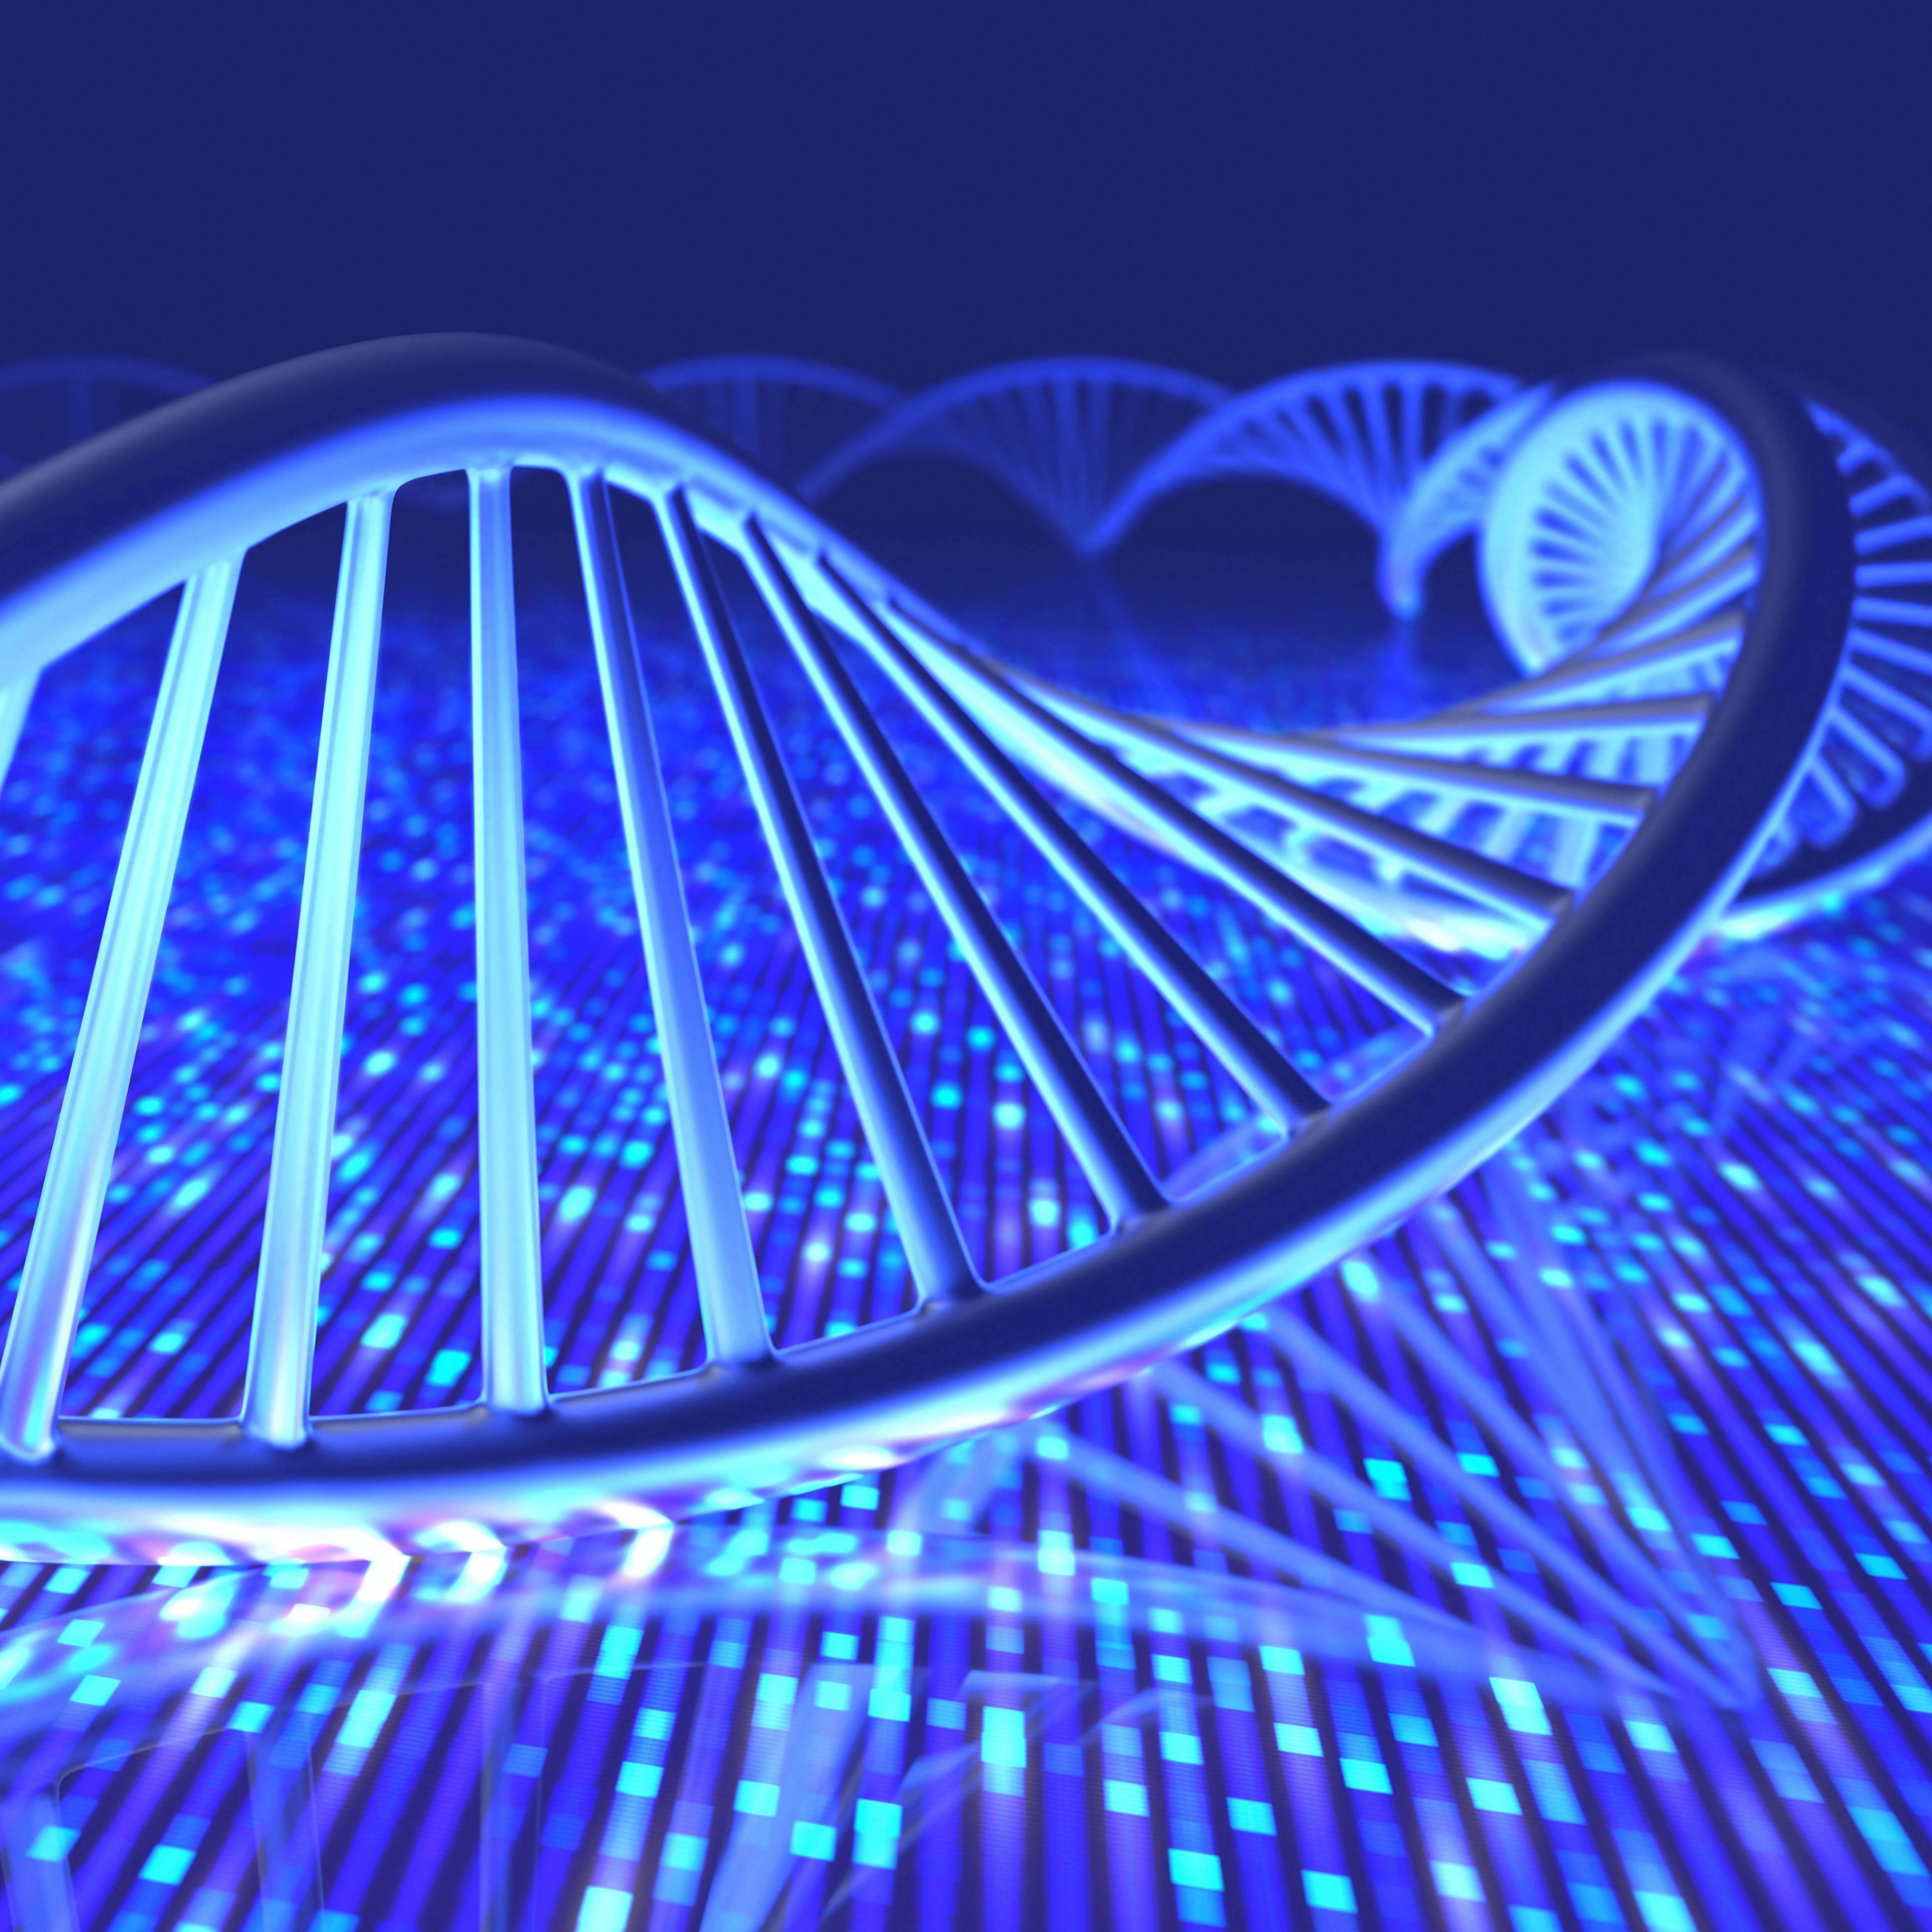 3D illustration, concept of DNA and Senger sequence